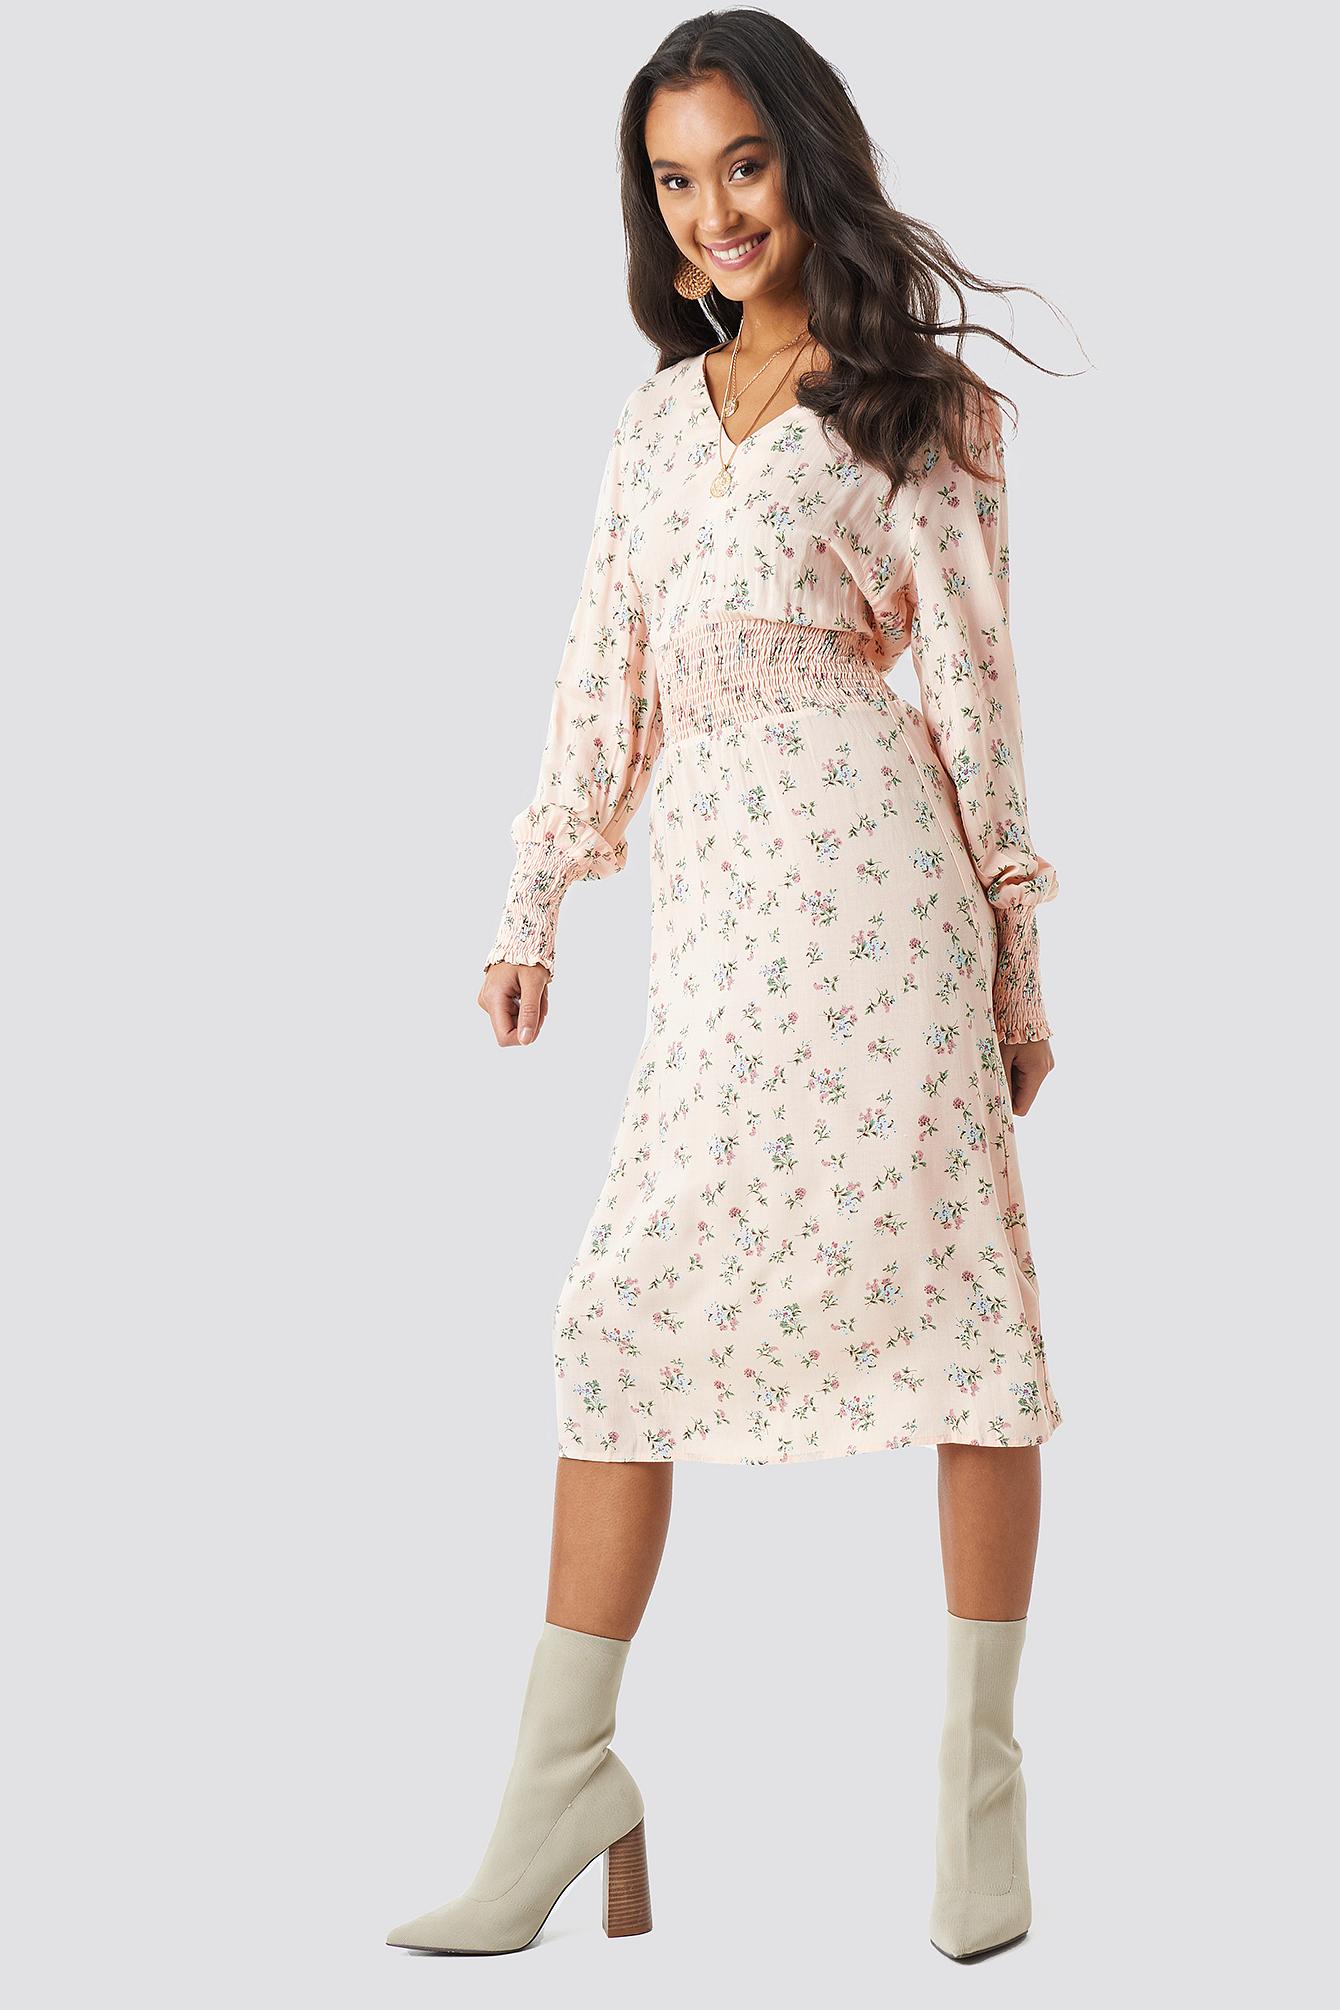 Shirred Flower Printed Dress NA-KD.COM